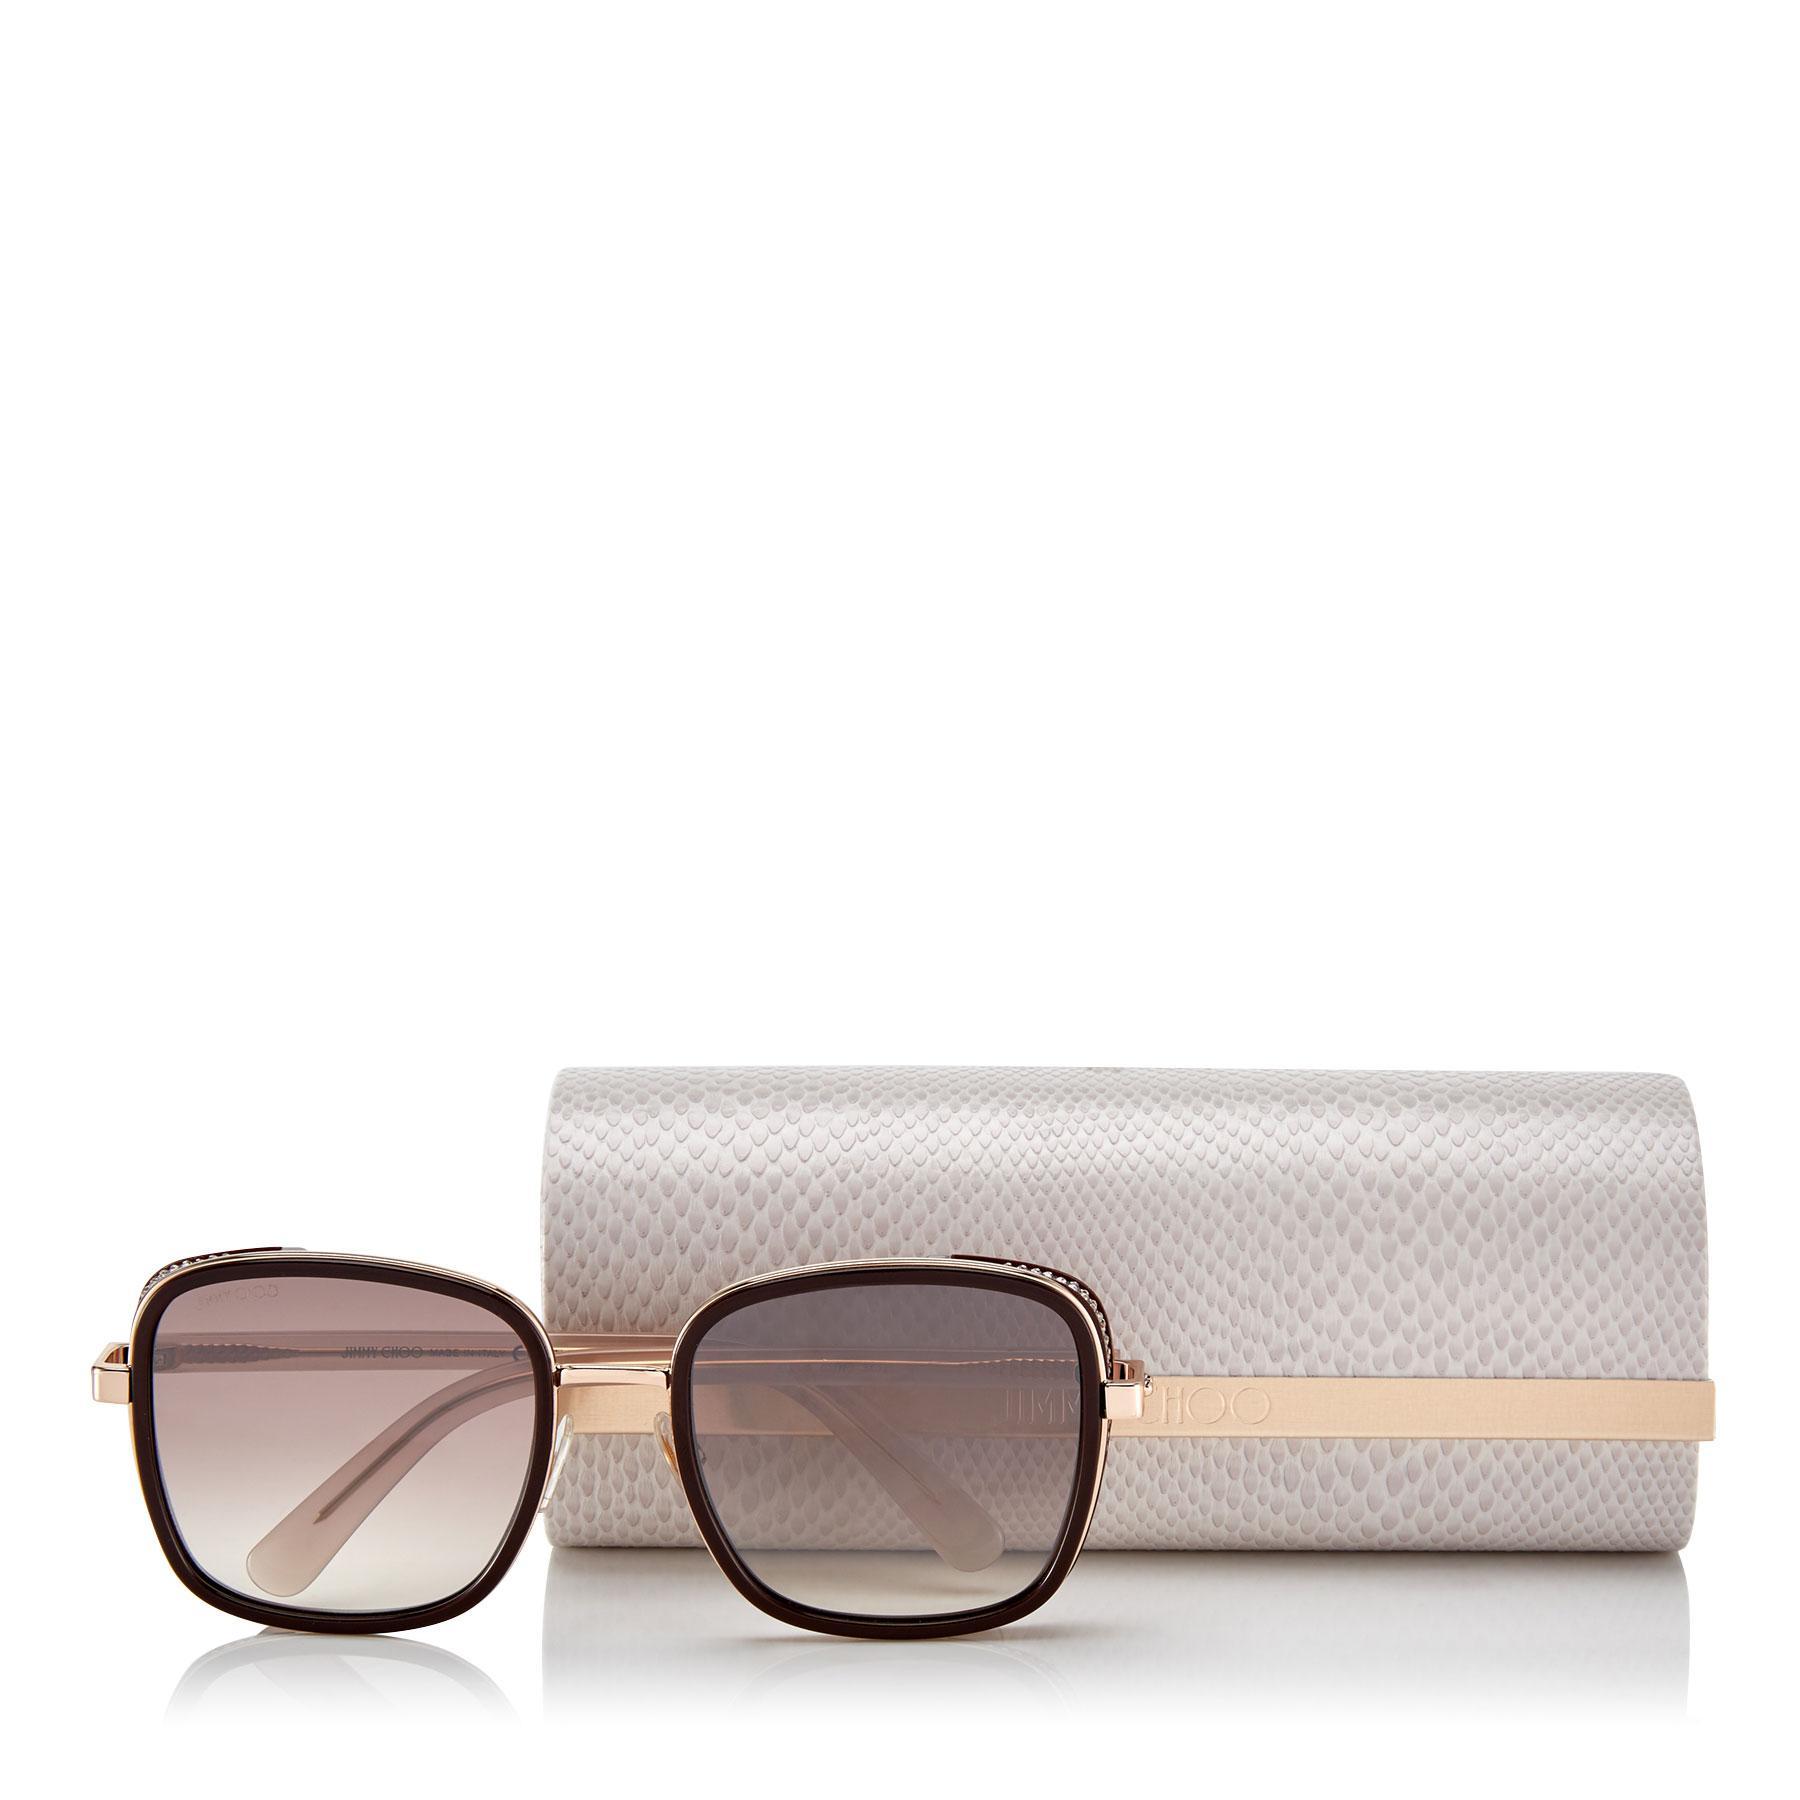 0de944595f4e8 Jimmy Choo - Metallic Elva Black And Rose Gold Metal Oversized Sunglasses  With Leopard Cavallino Leather. View fullscreen